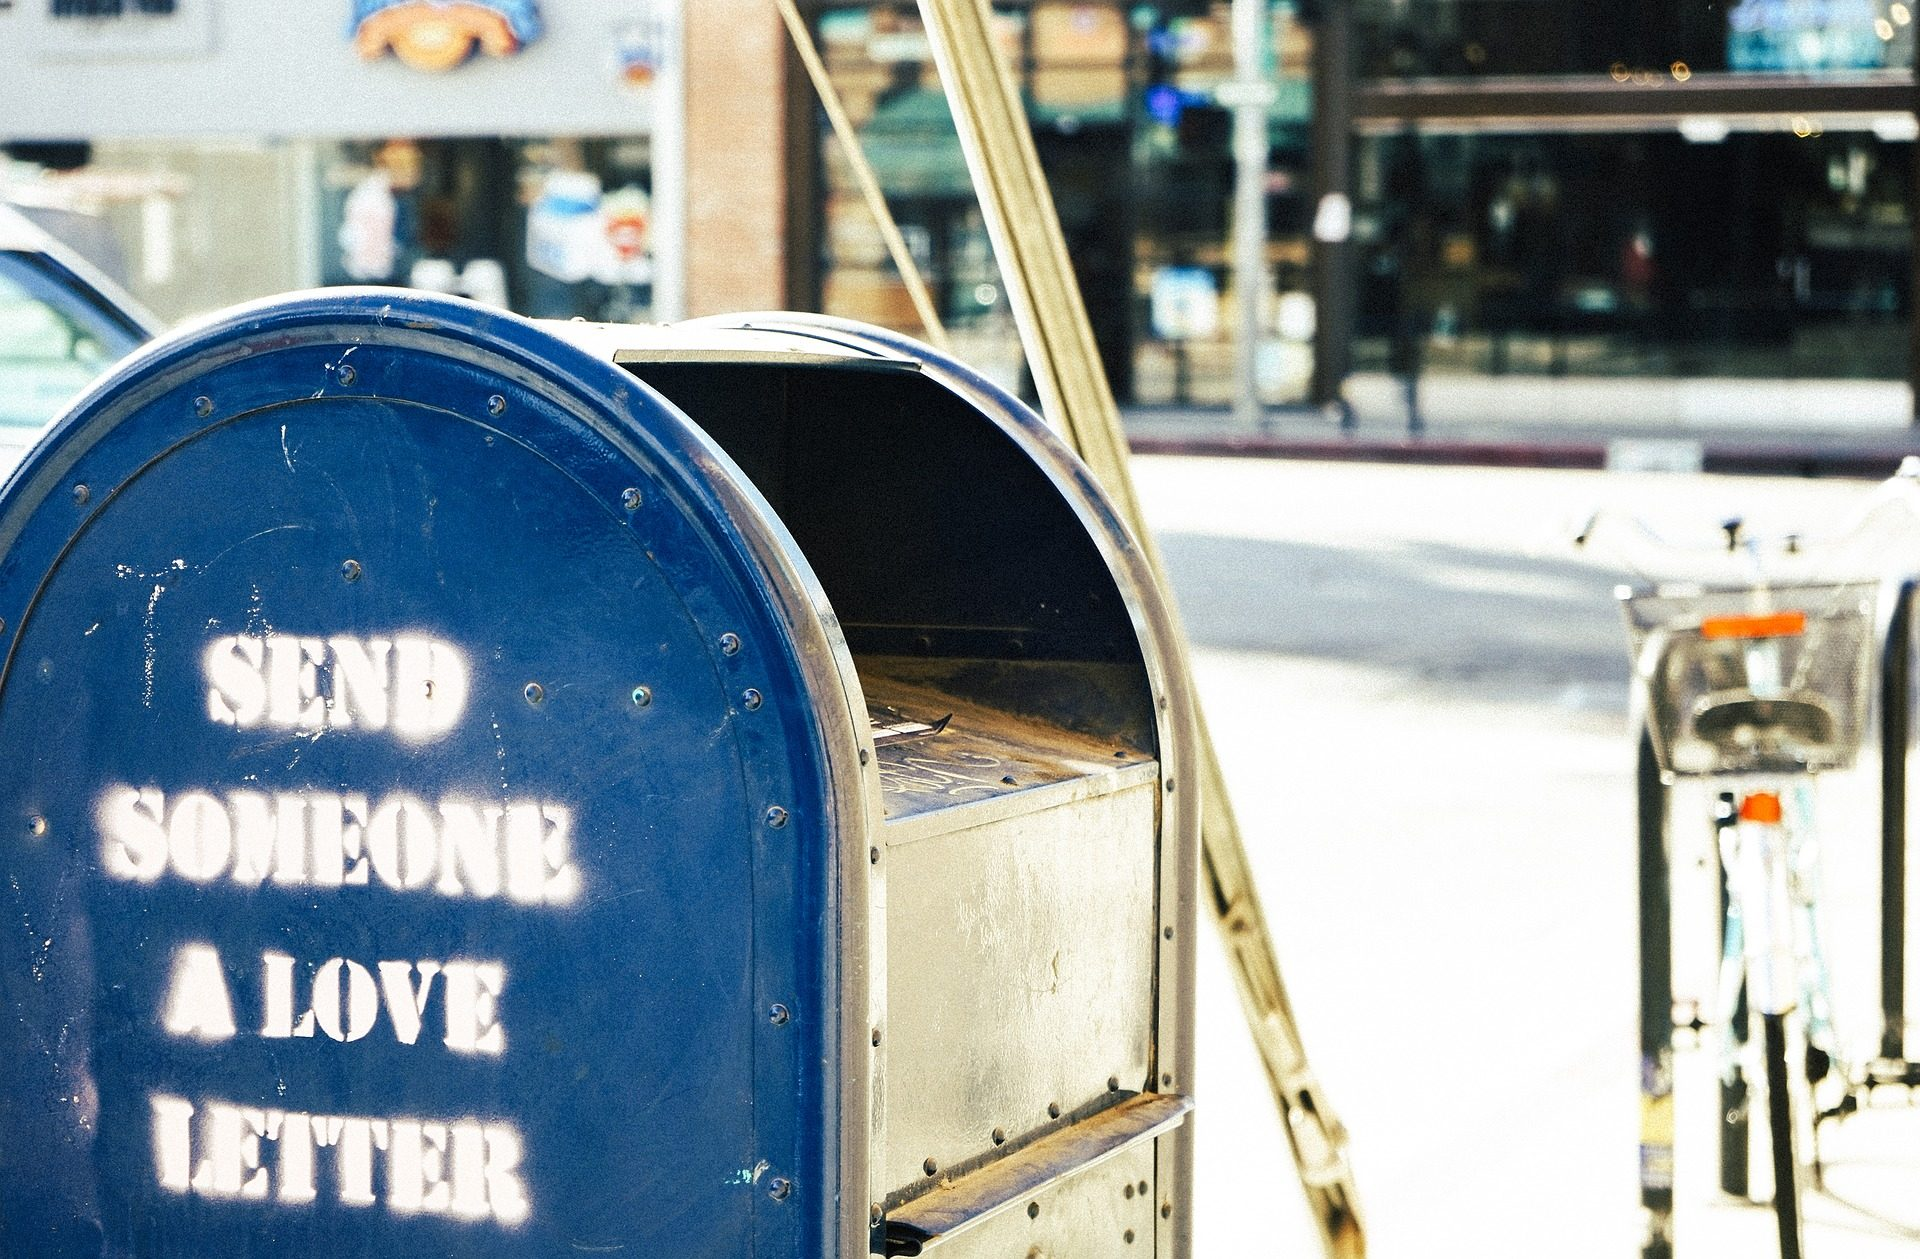 buzón, 消息, 信, 邮件, 邮政, 城市 - 高清壁纸 - 教授-falken.com